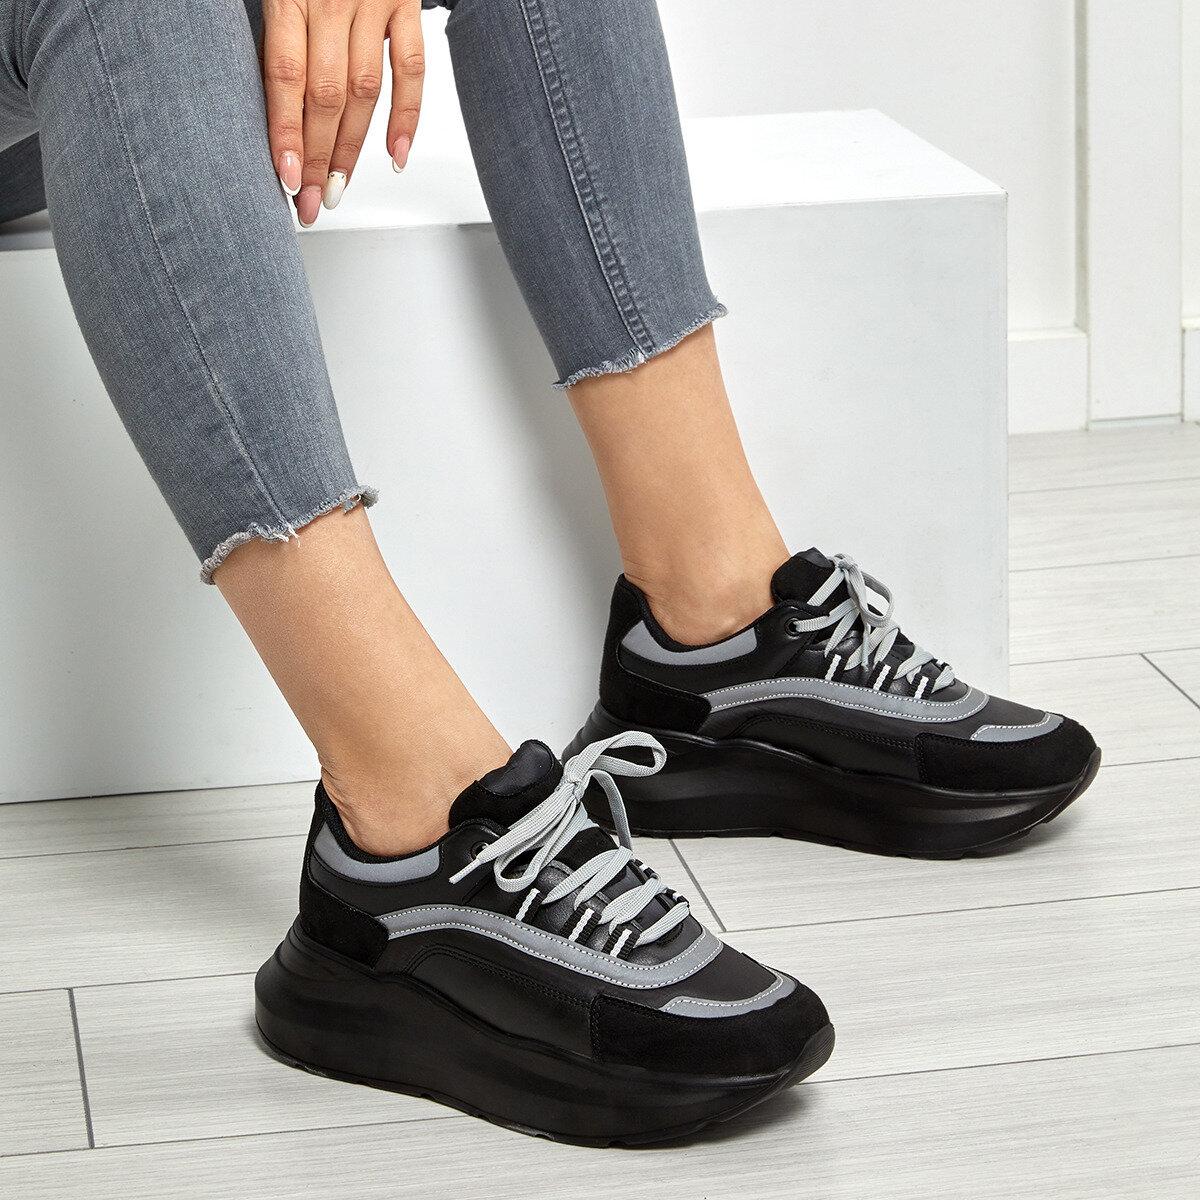 FLO Women Casual Sneakers Sport Spring Autumn Sneakers Breathable Women Shoes Lace Up Female Boots Comrfortable Platform Shoes Women Black BUTIGO 19SF-2058